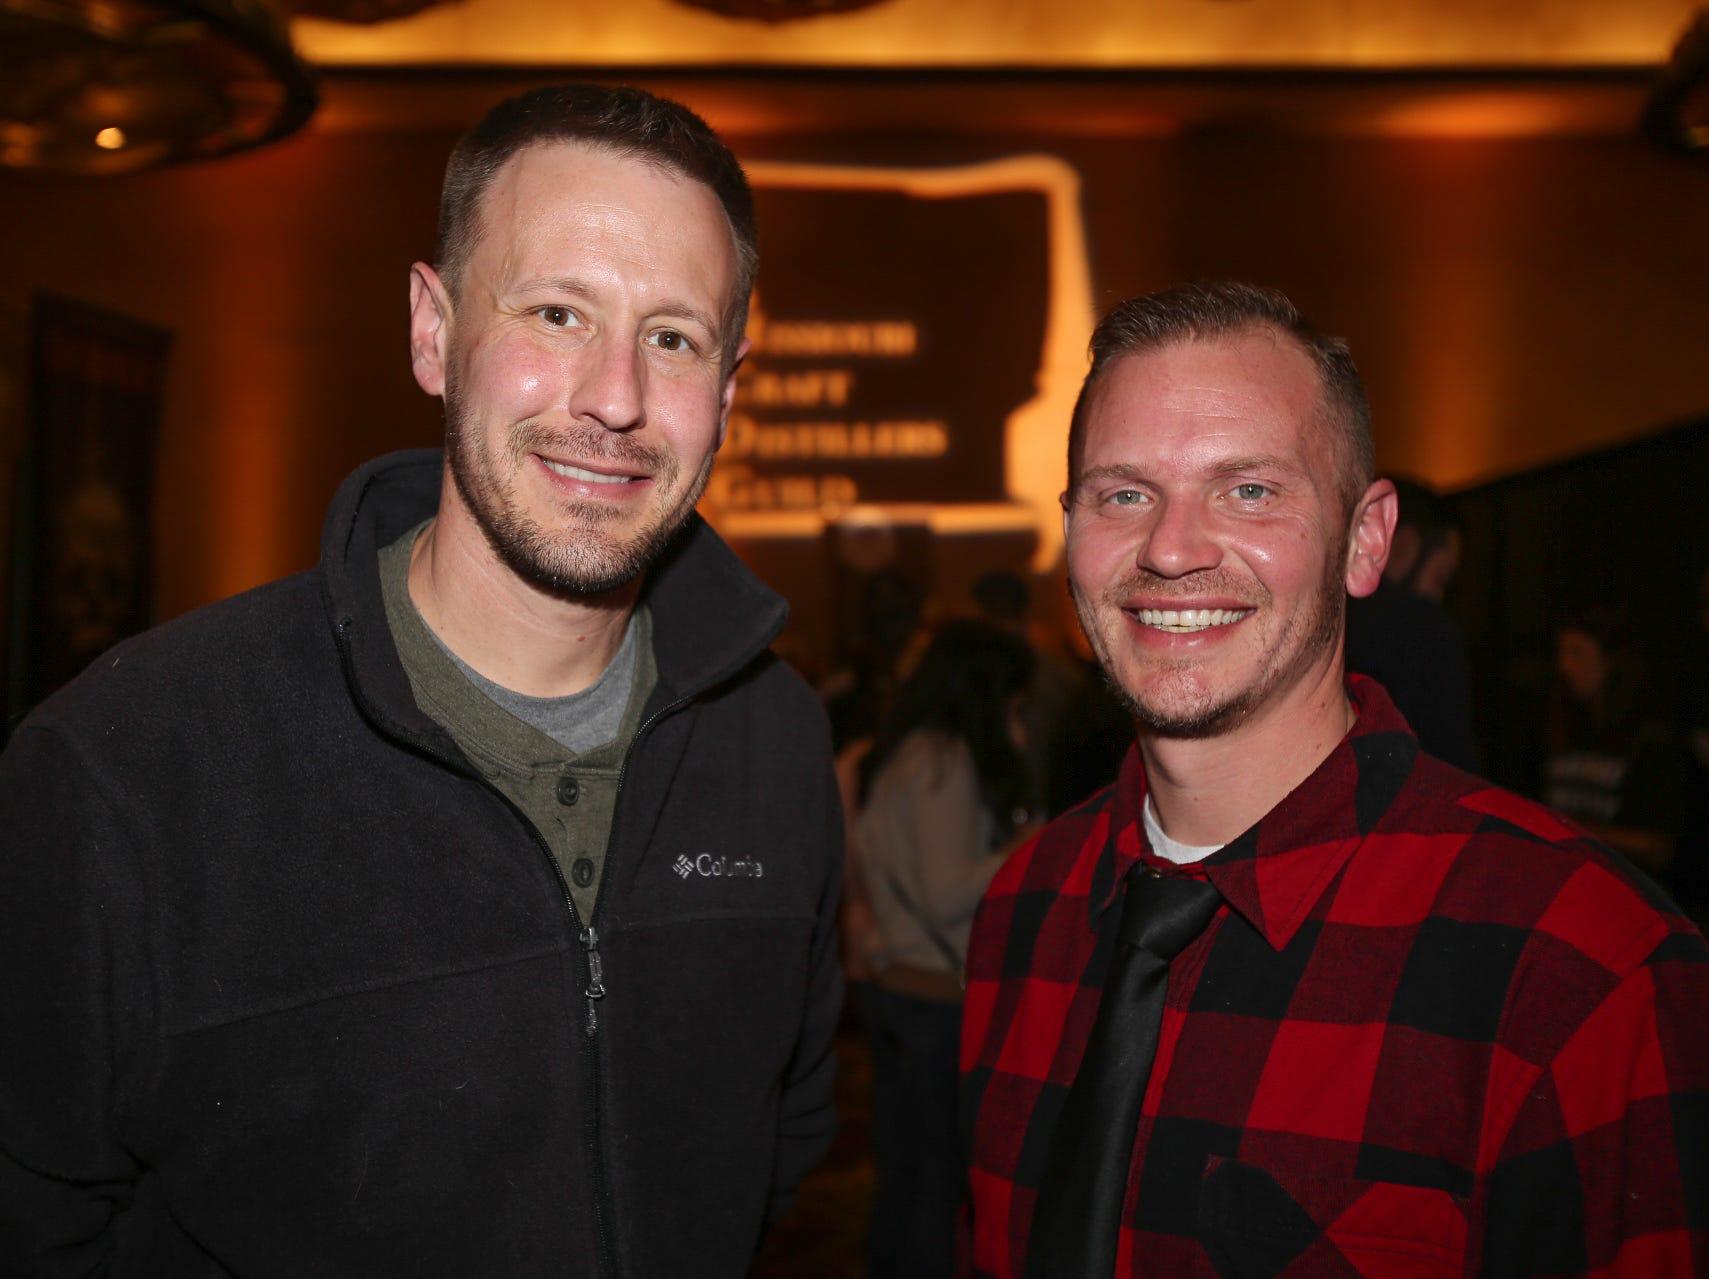 Brady Long and Chris Vandergriff